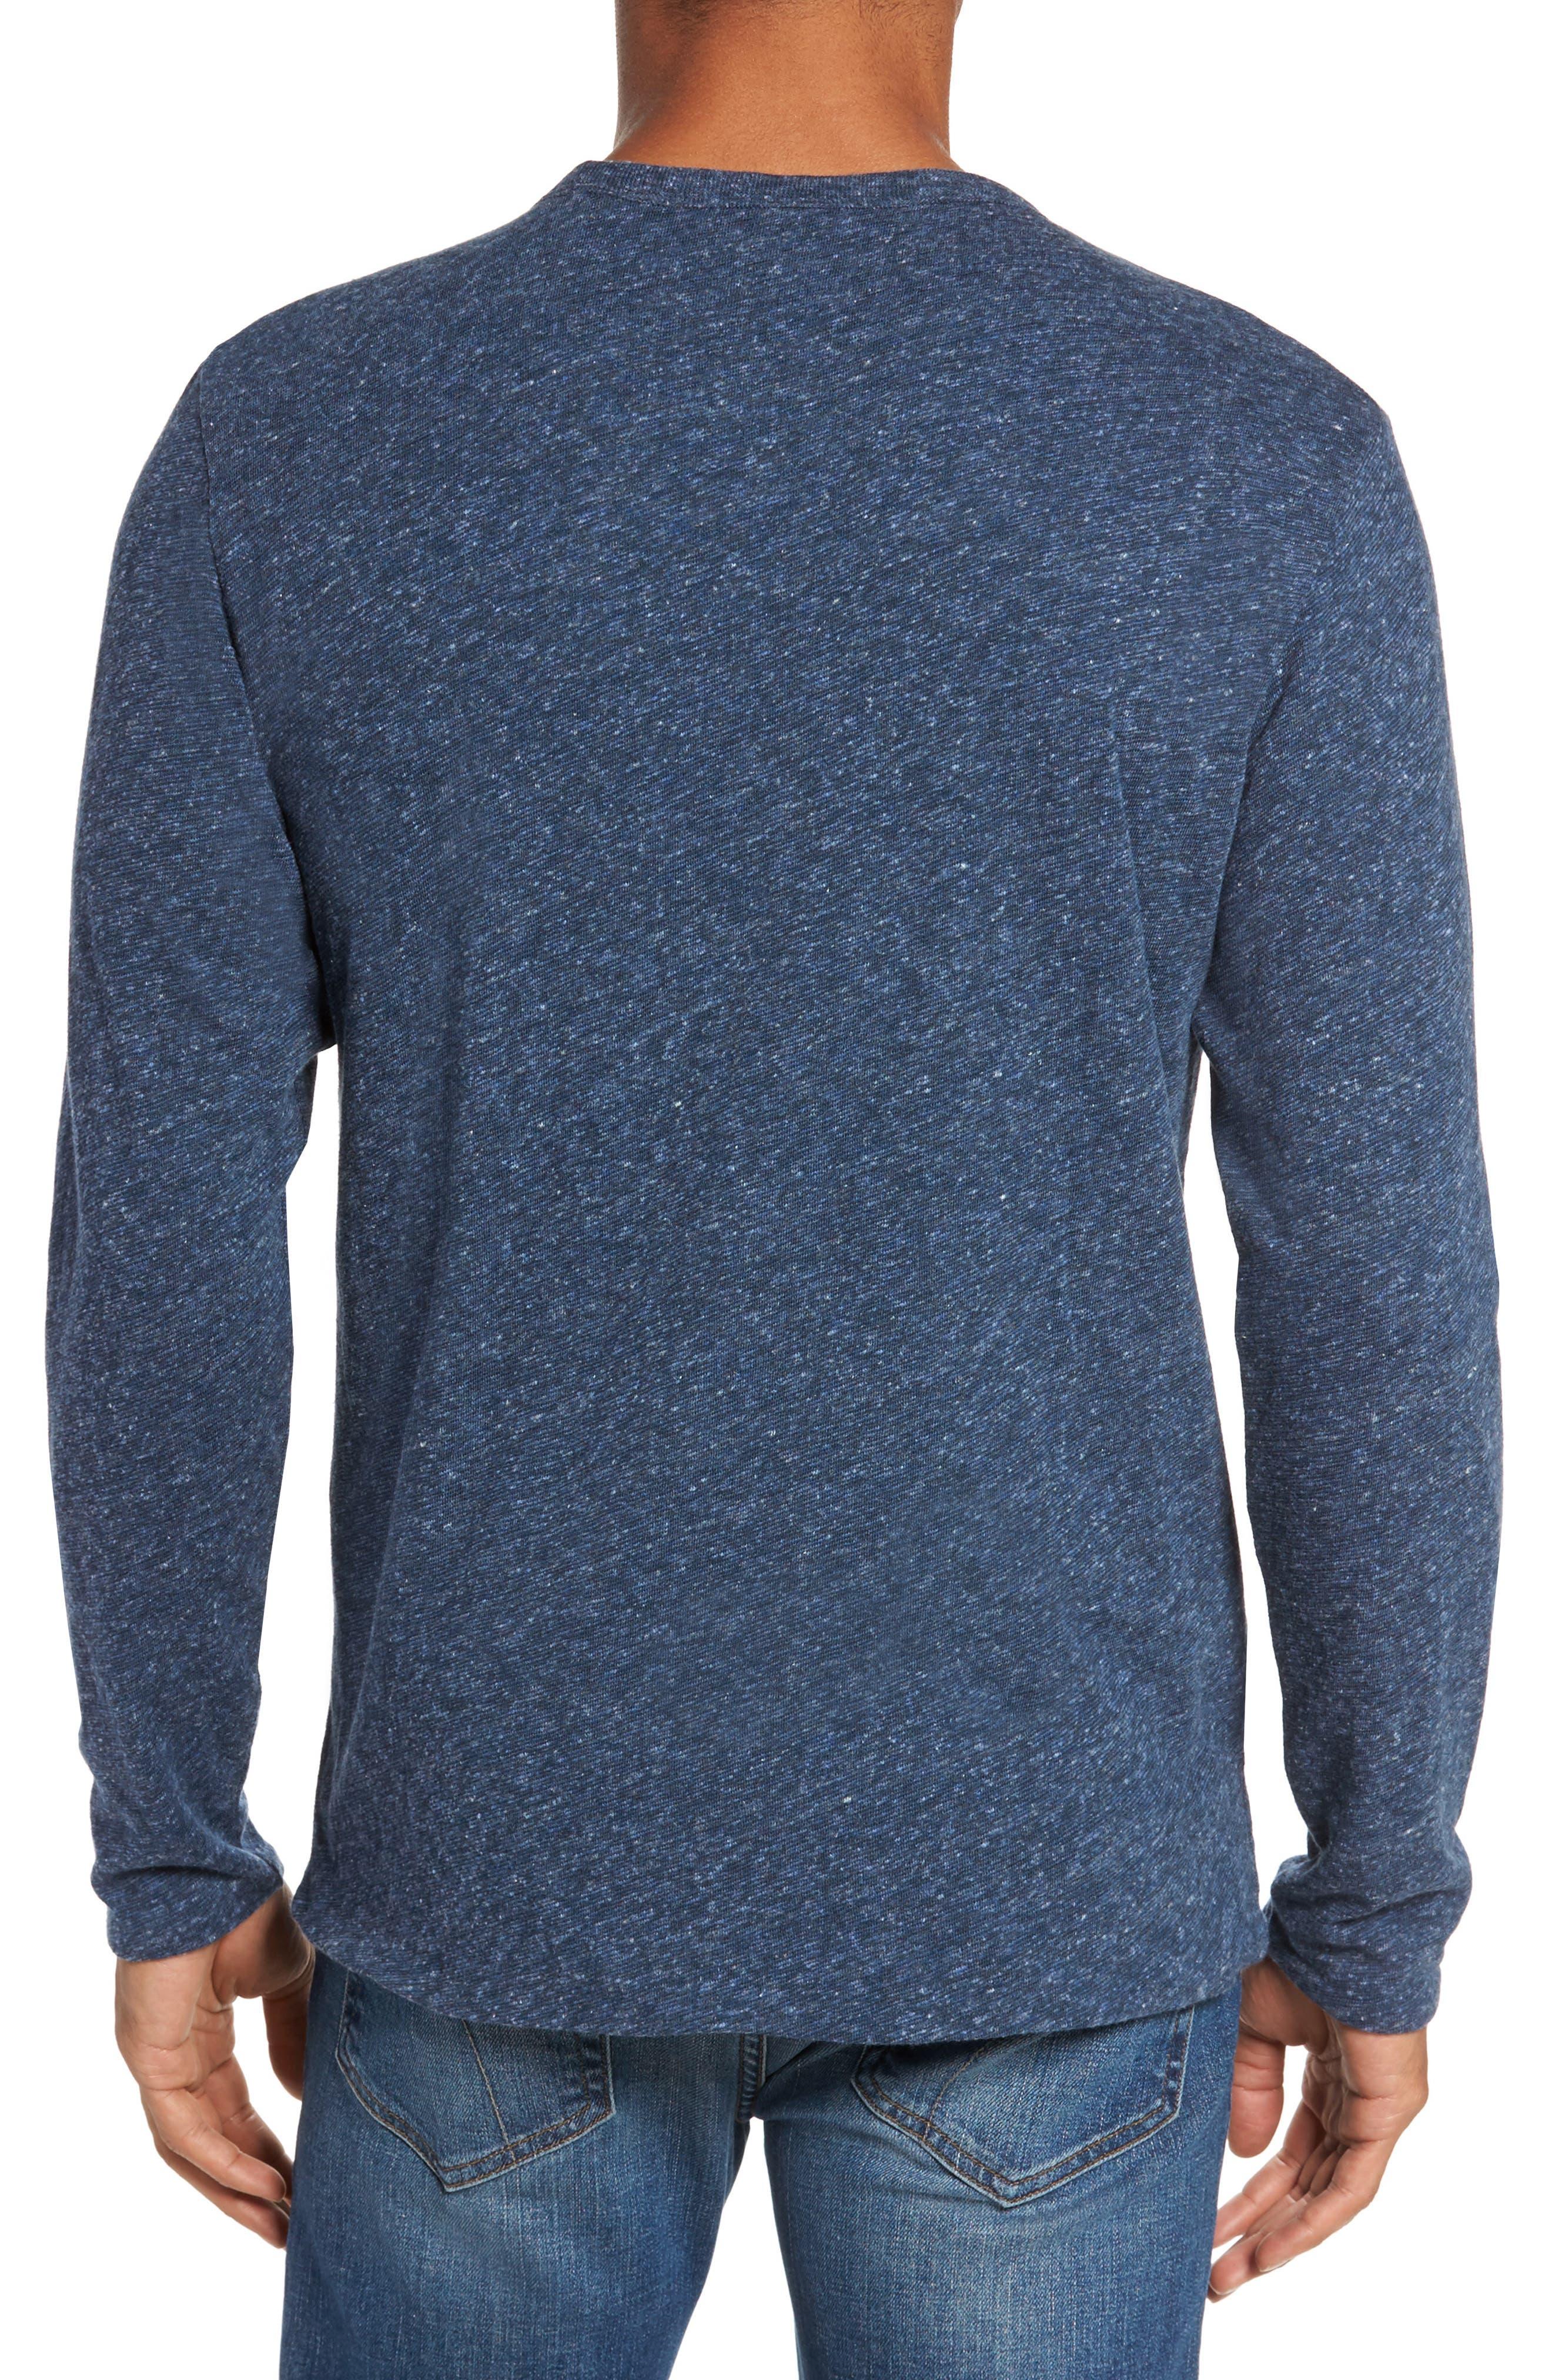 Alternate Image 2  - Faherty Heathered Reversible Long Sleeve Crewneck T-Shirt